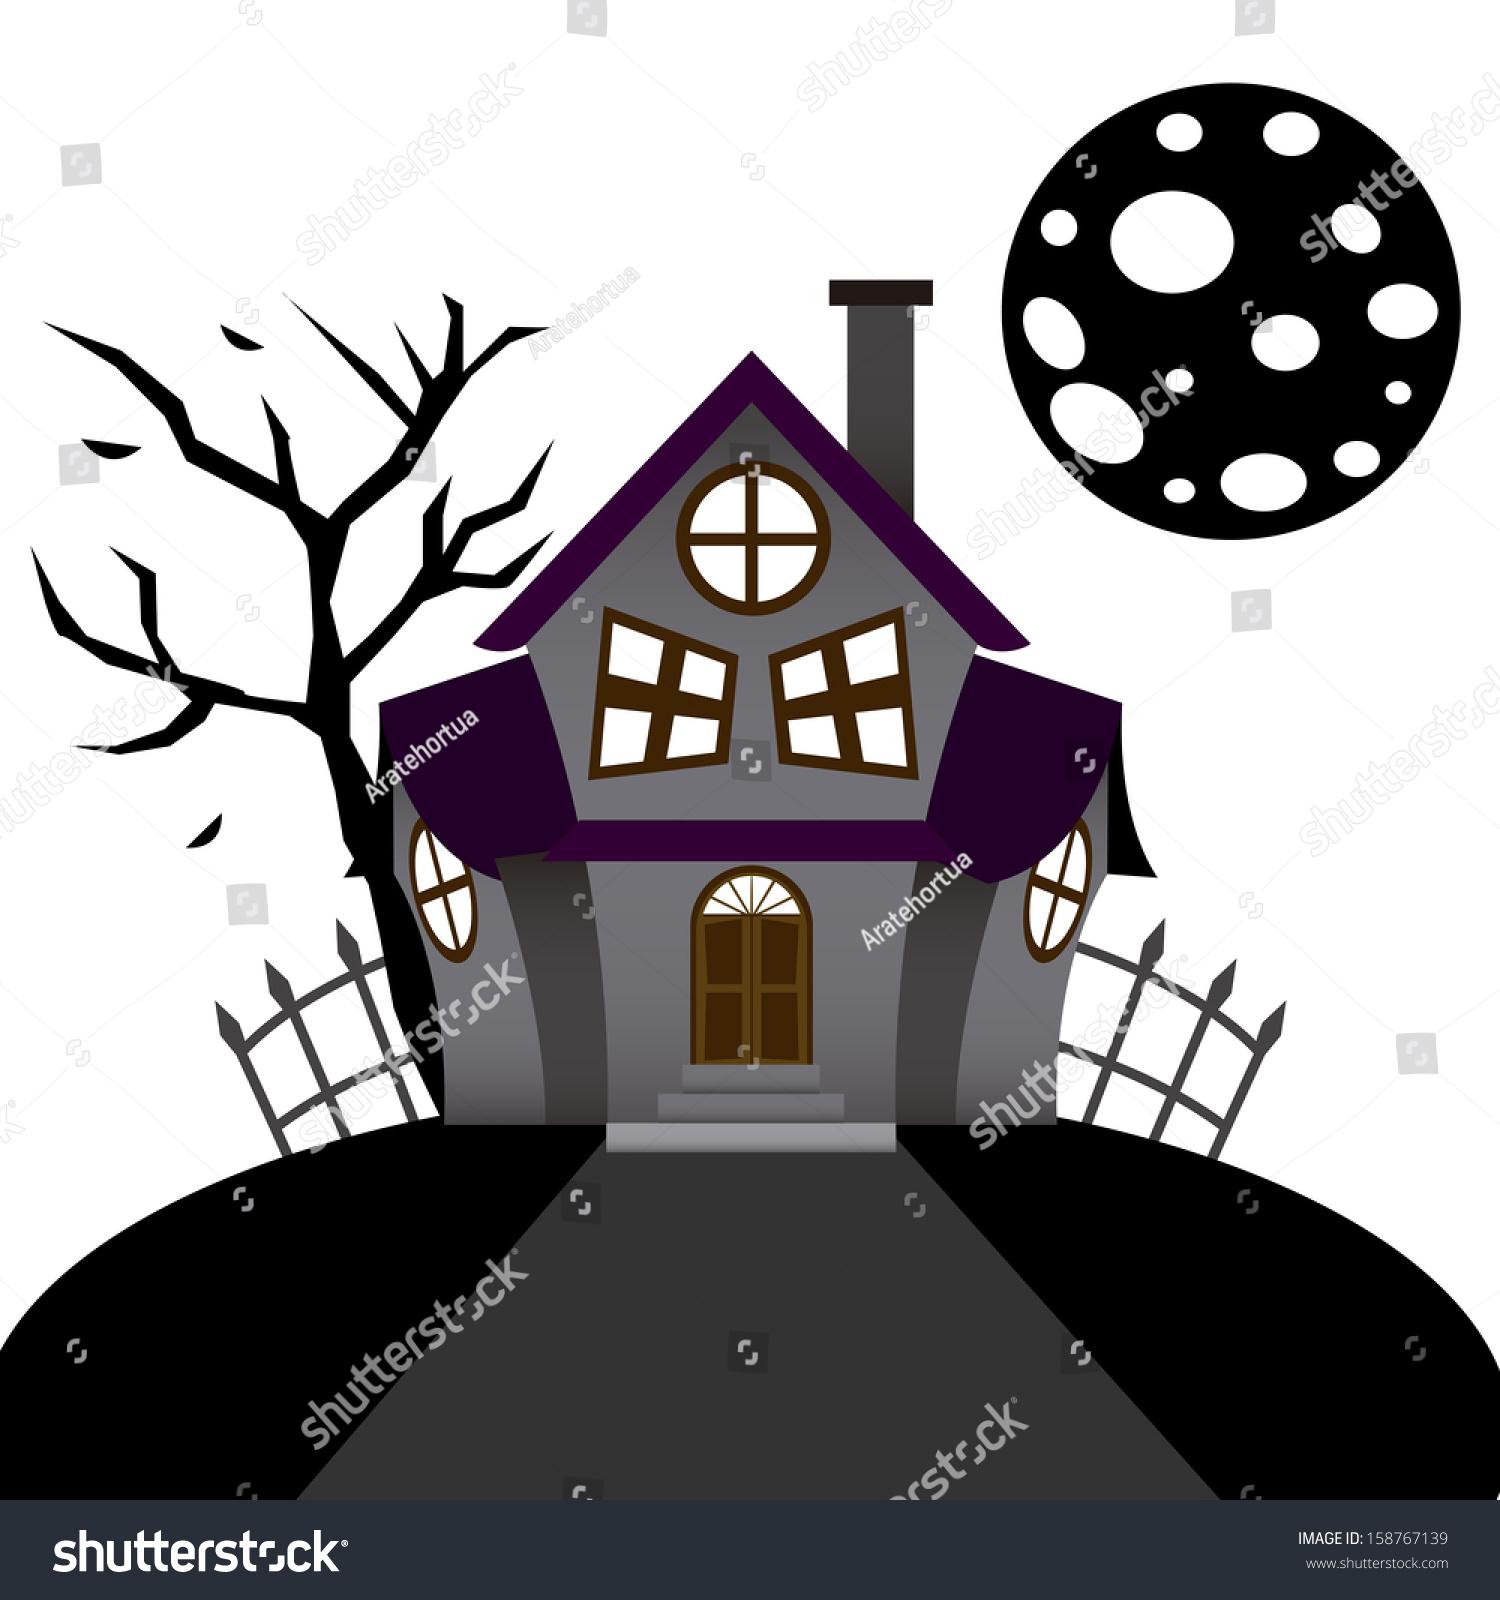 Vector cartoon funny haunted house on stock vector - Cartoon haunted house pics ...